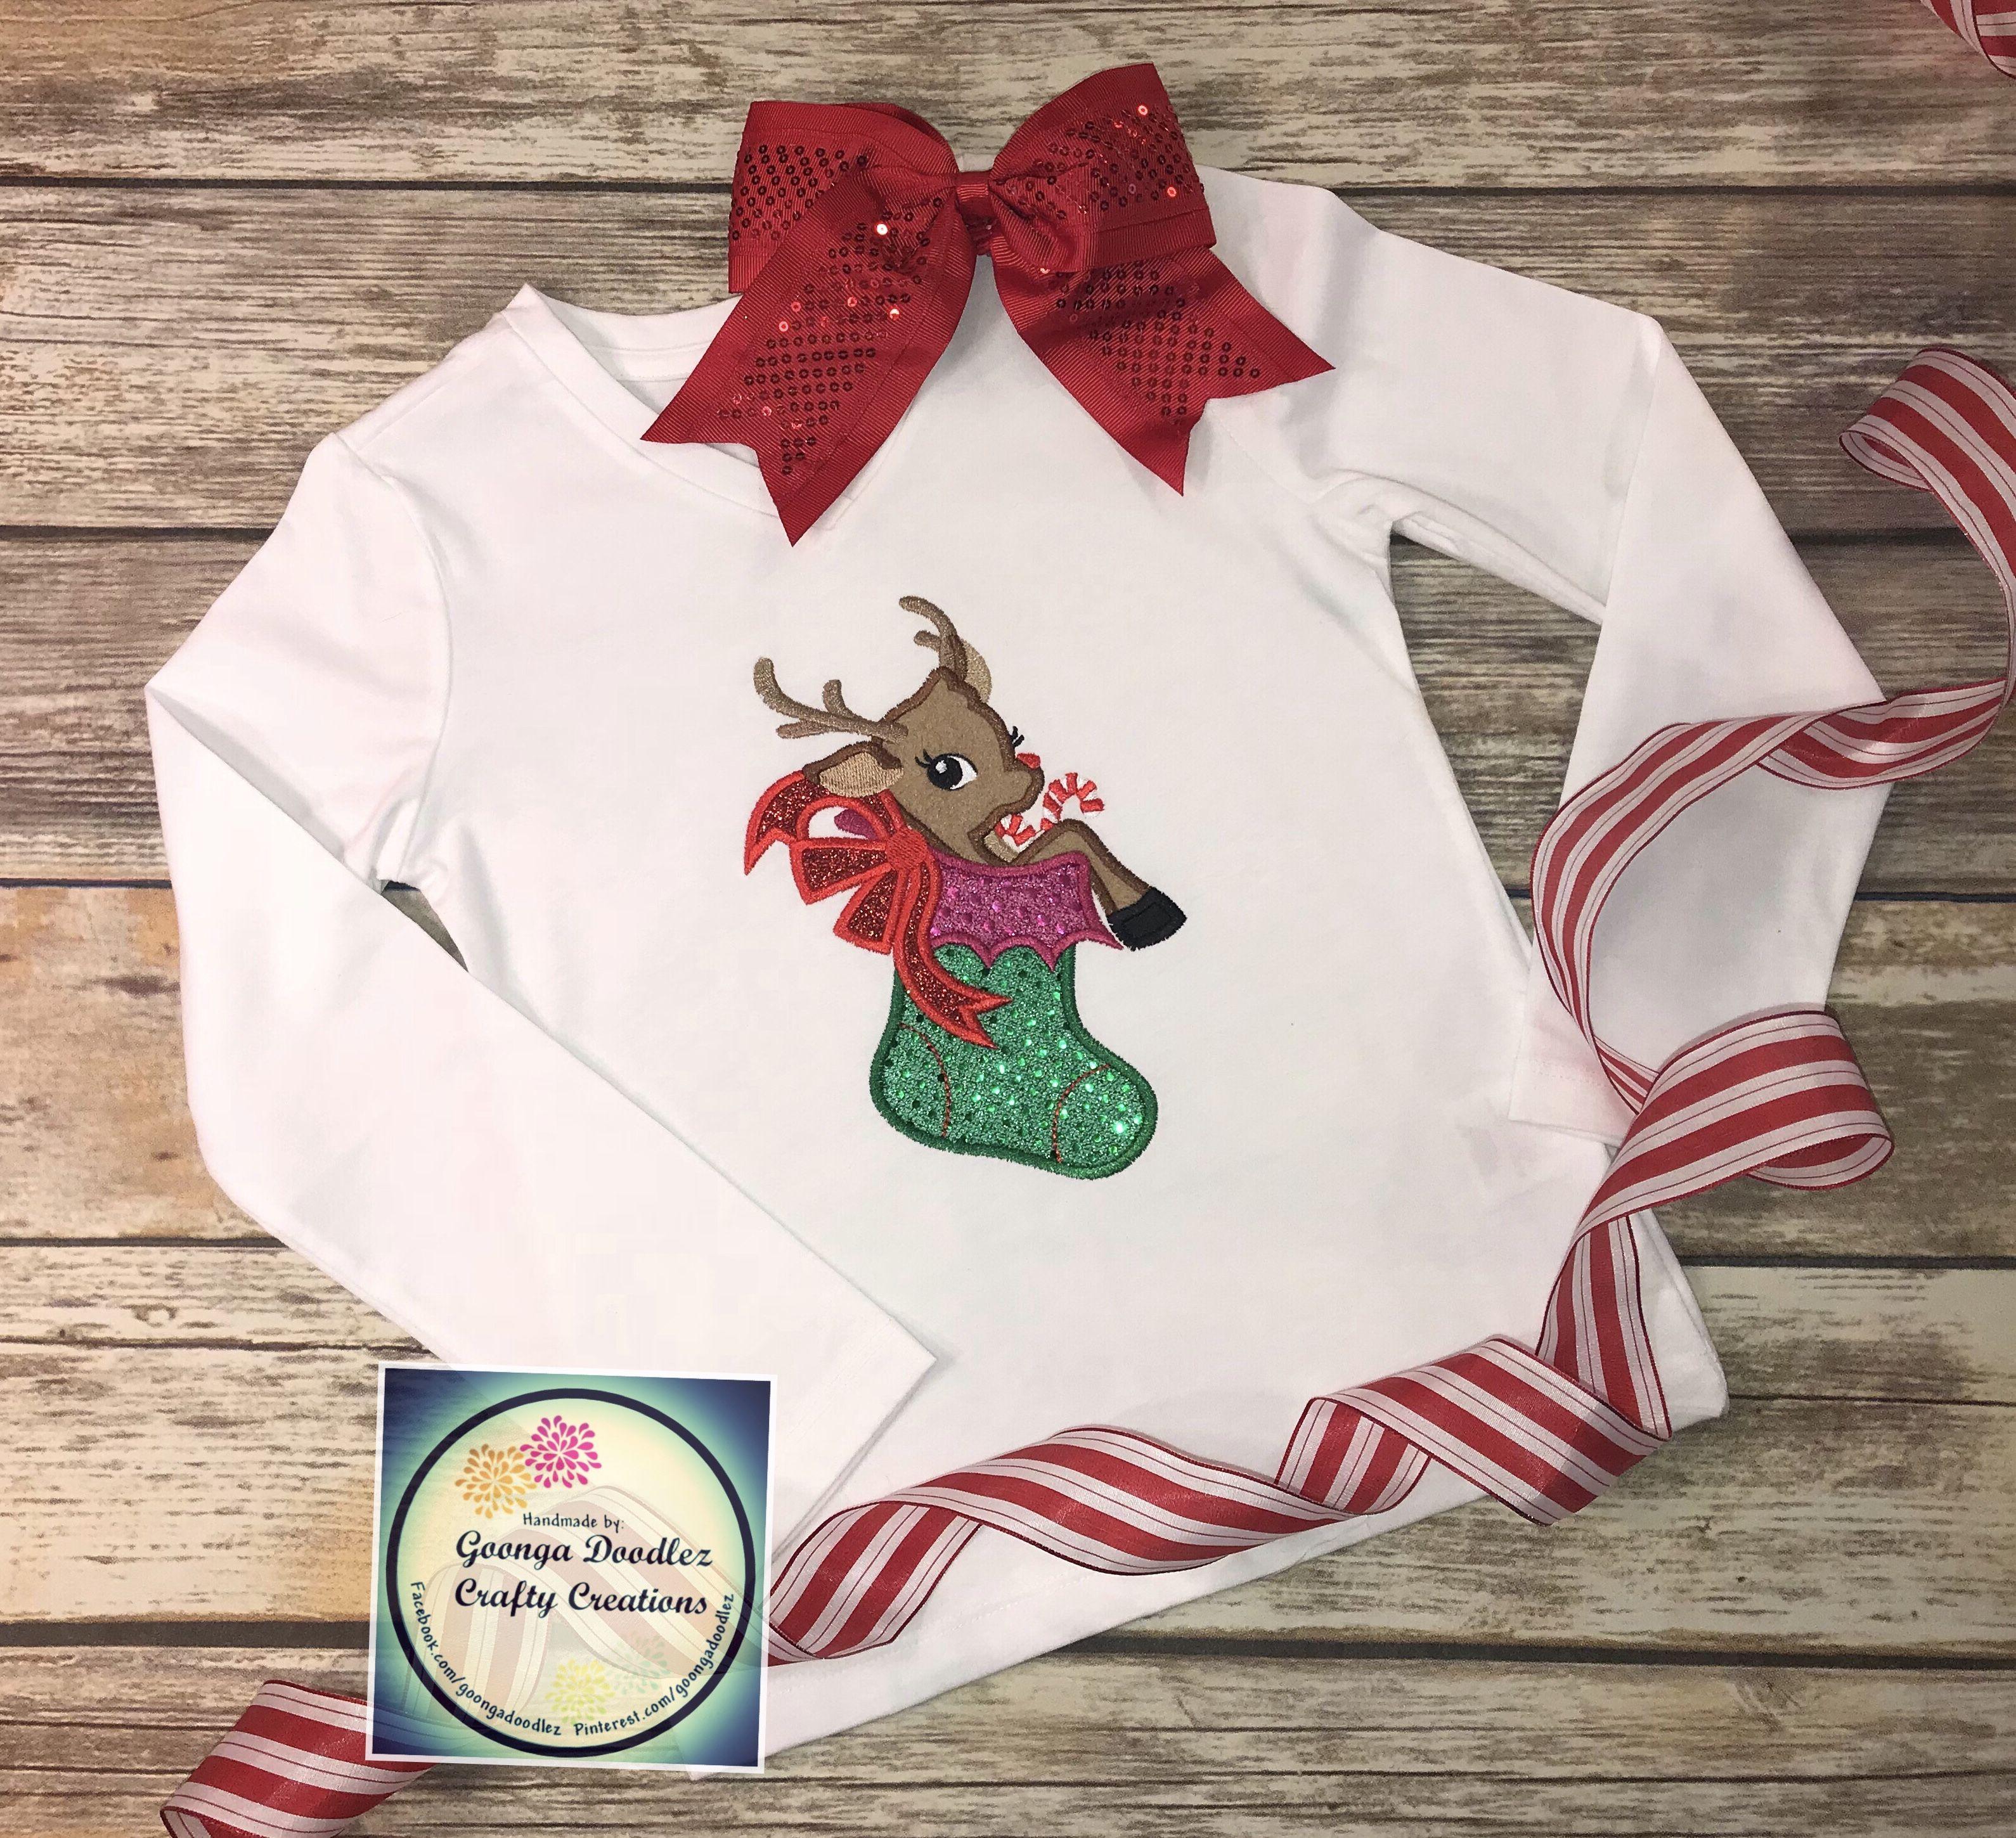 d74ca92a4 Deer in Stocking shirt - Embroidered Christmas shirt - Girl - Goonga ...